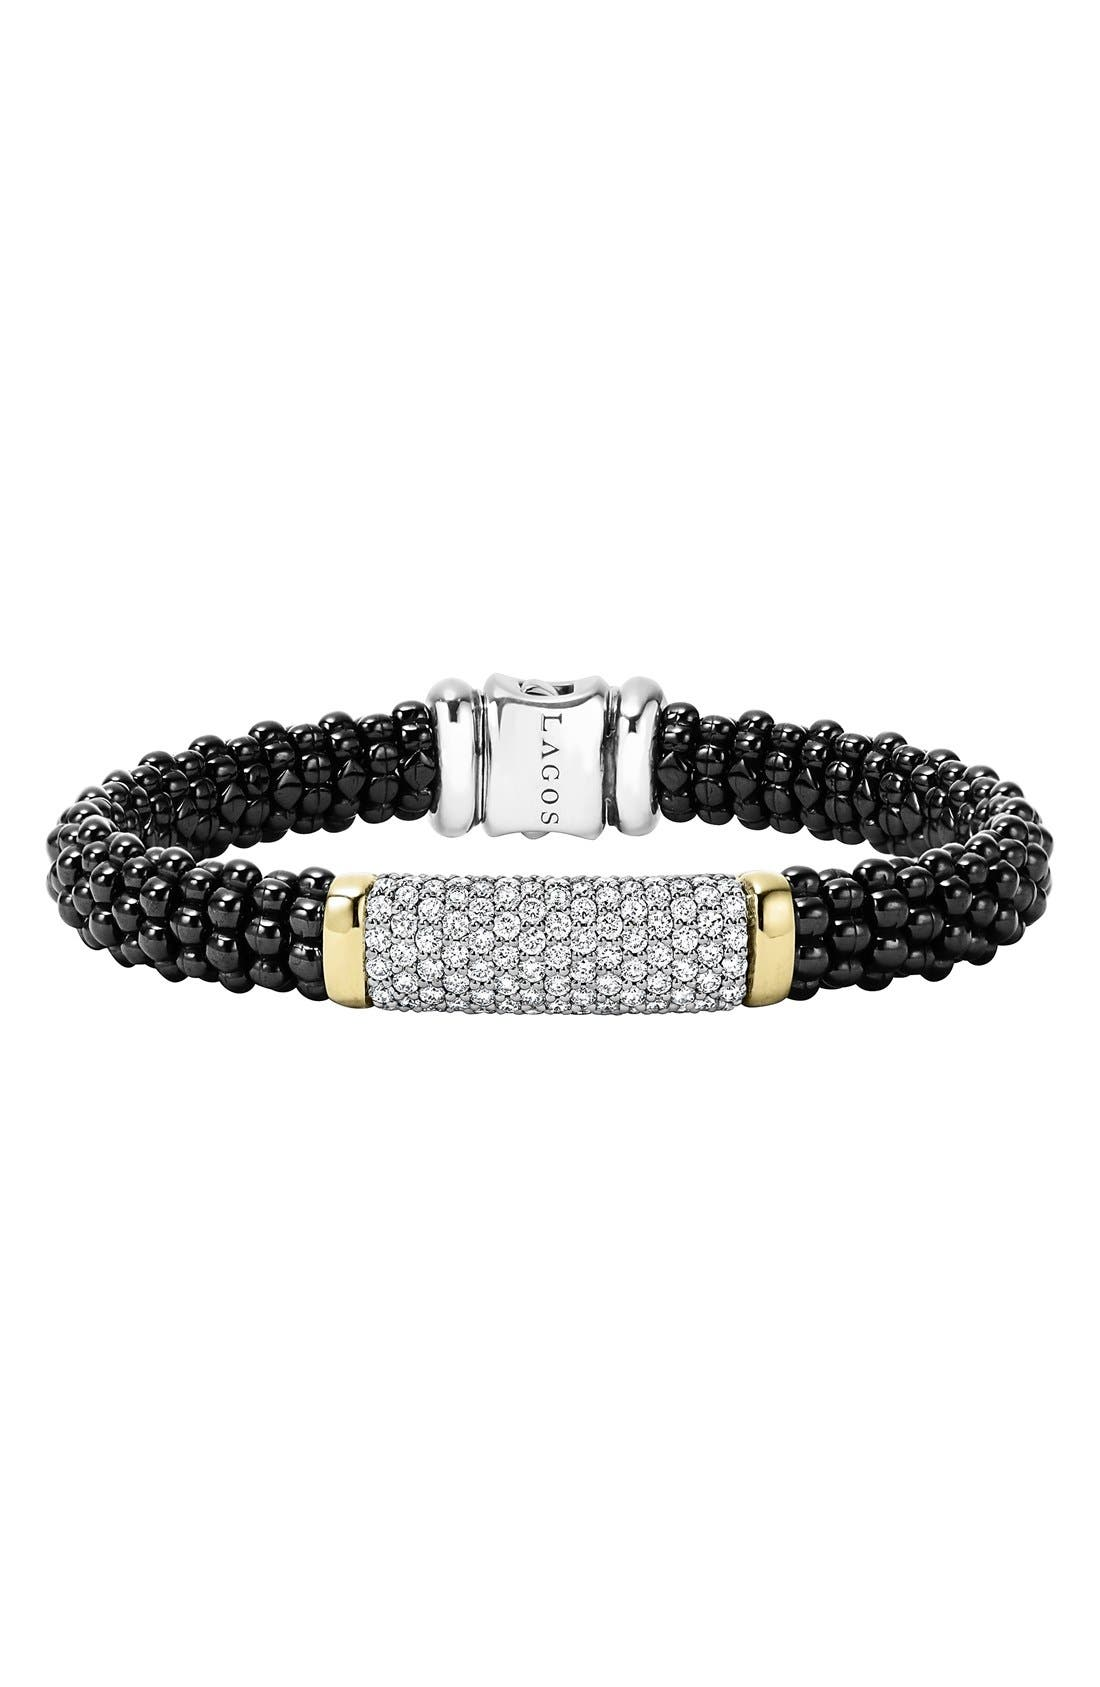 'Black Caviar' Diamond Rope Bracelet,                         Main,                         color, Black Caviar/ Gold